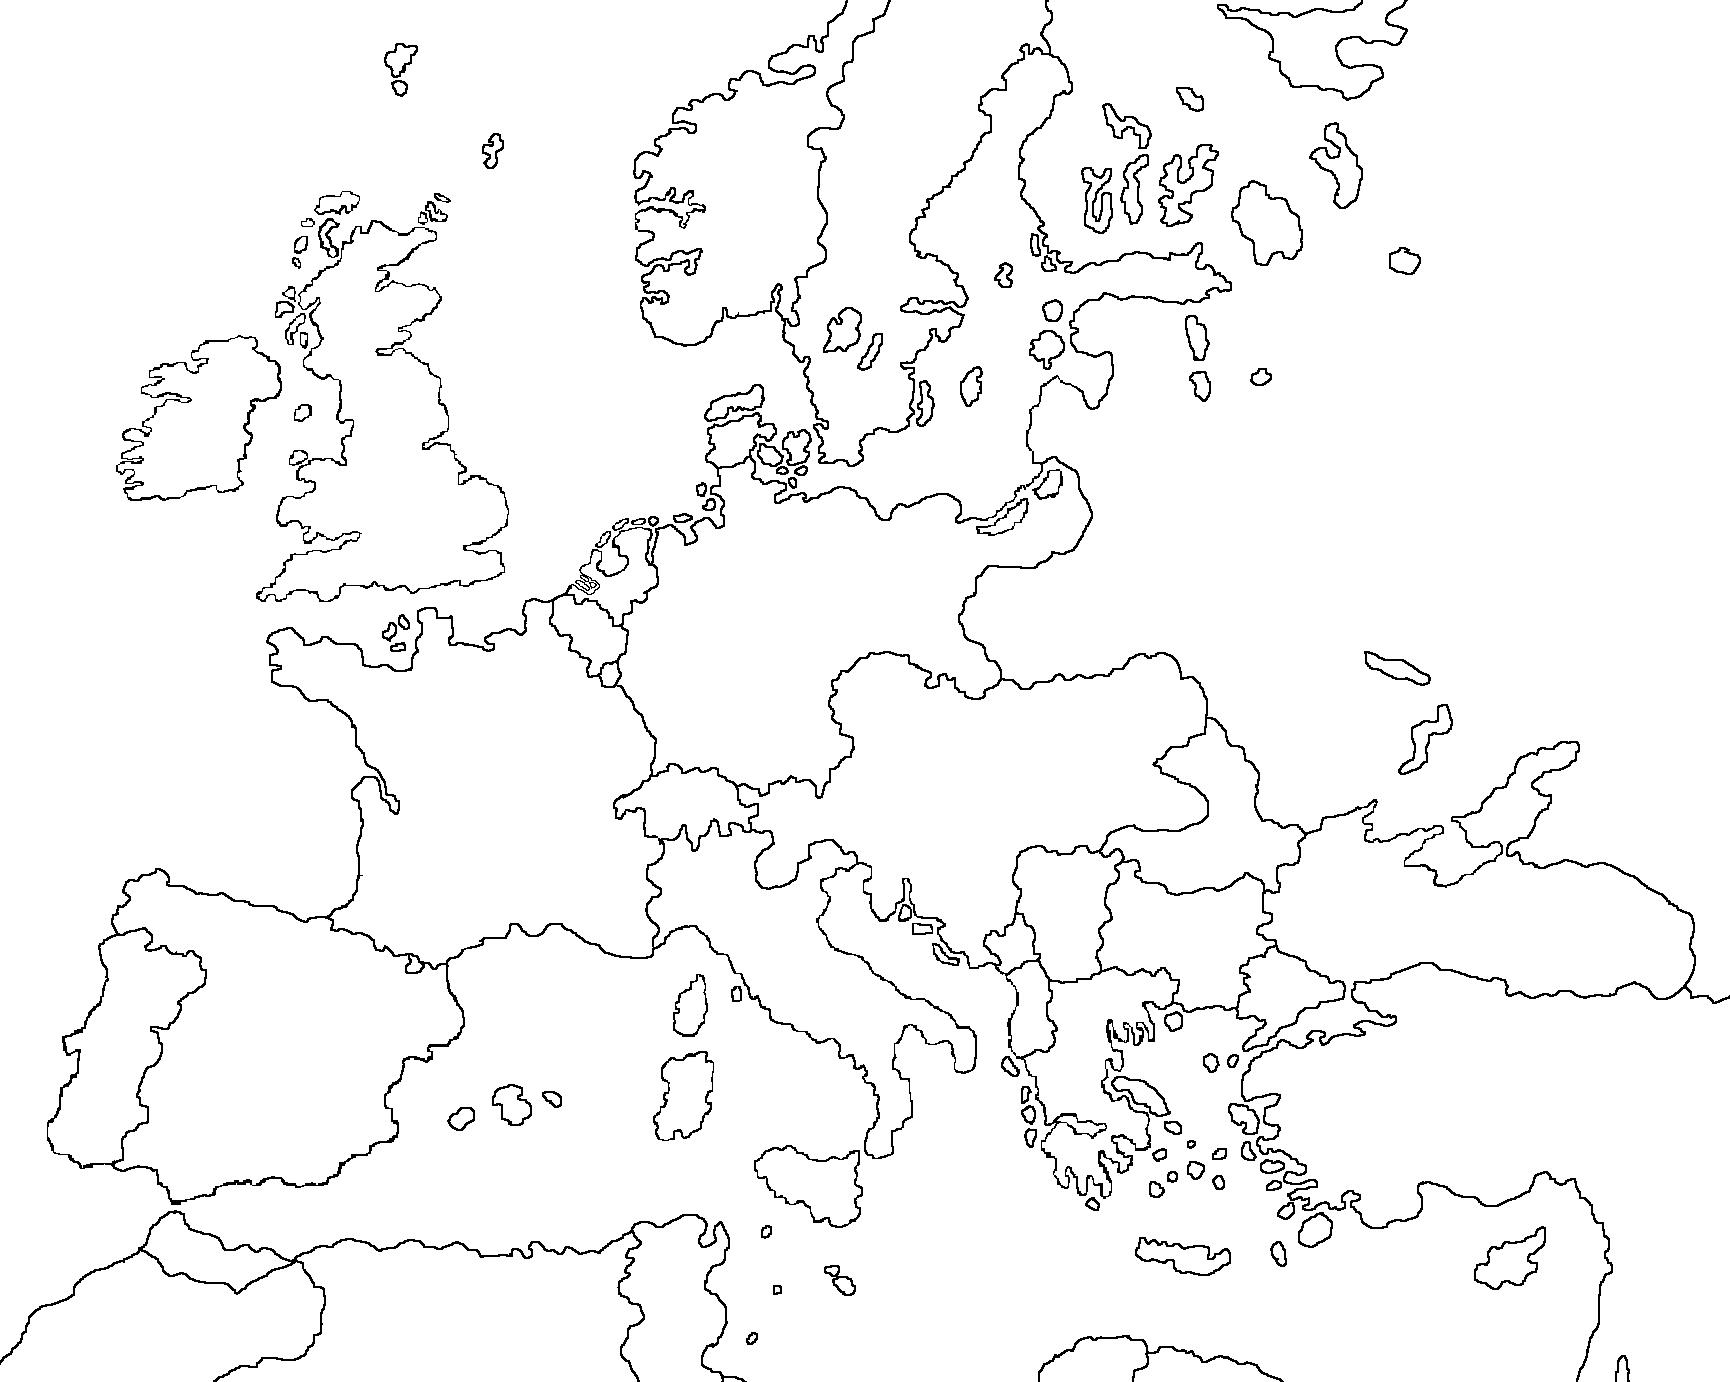 blank map of europe 2016 25 Luxury Printable Map Of Europe 2016